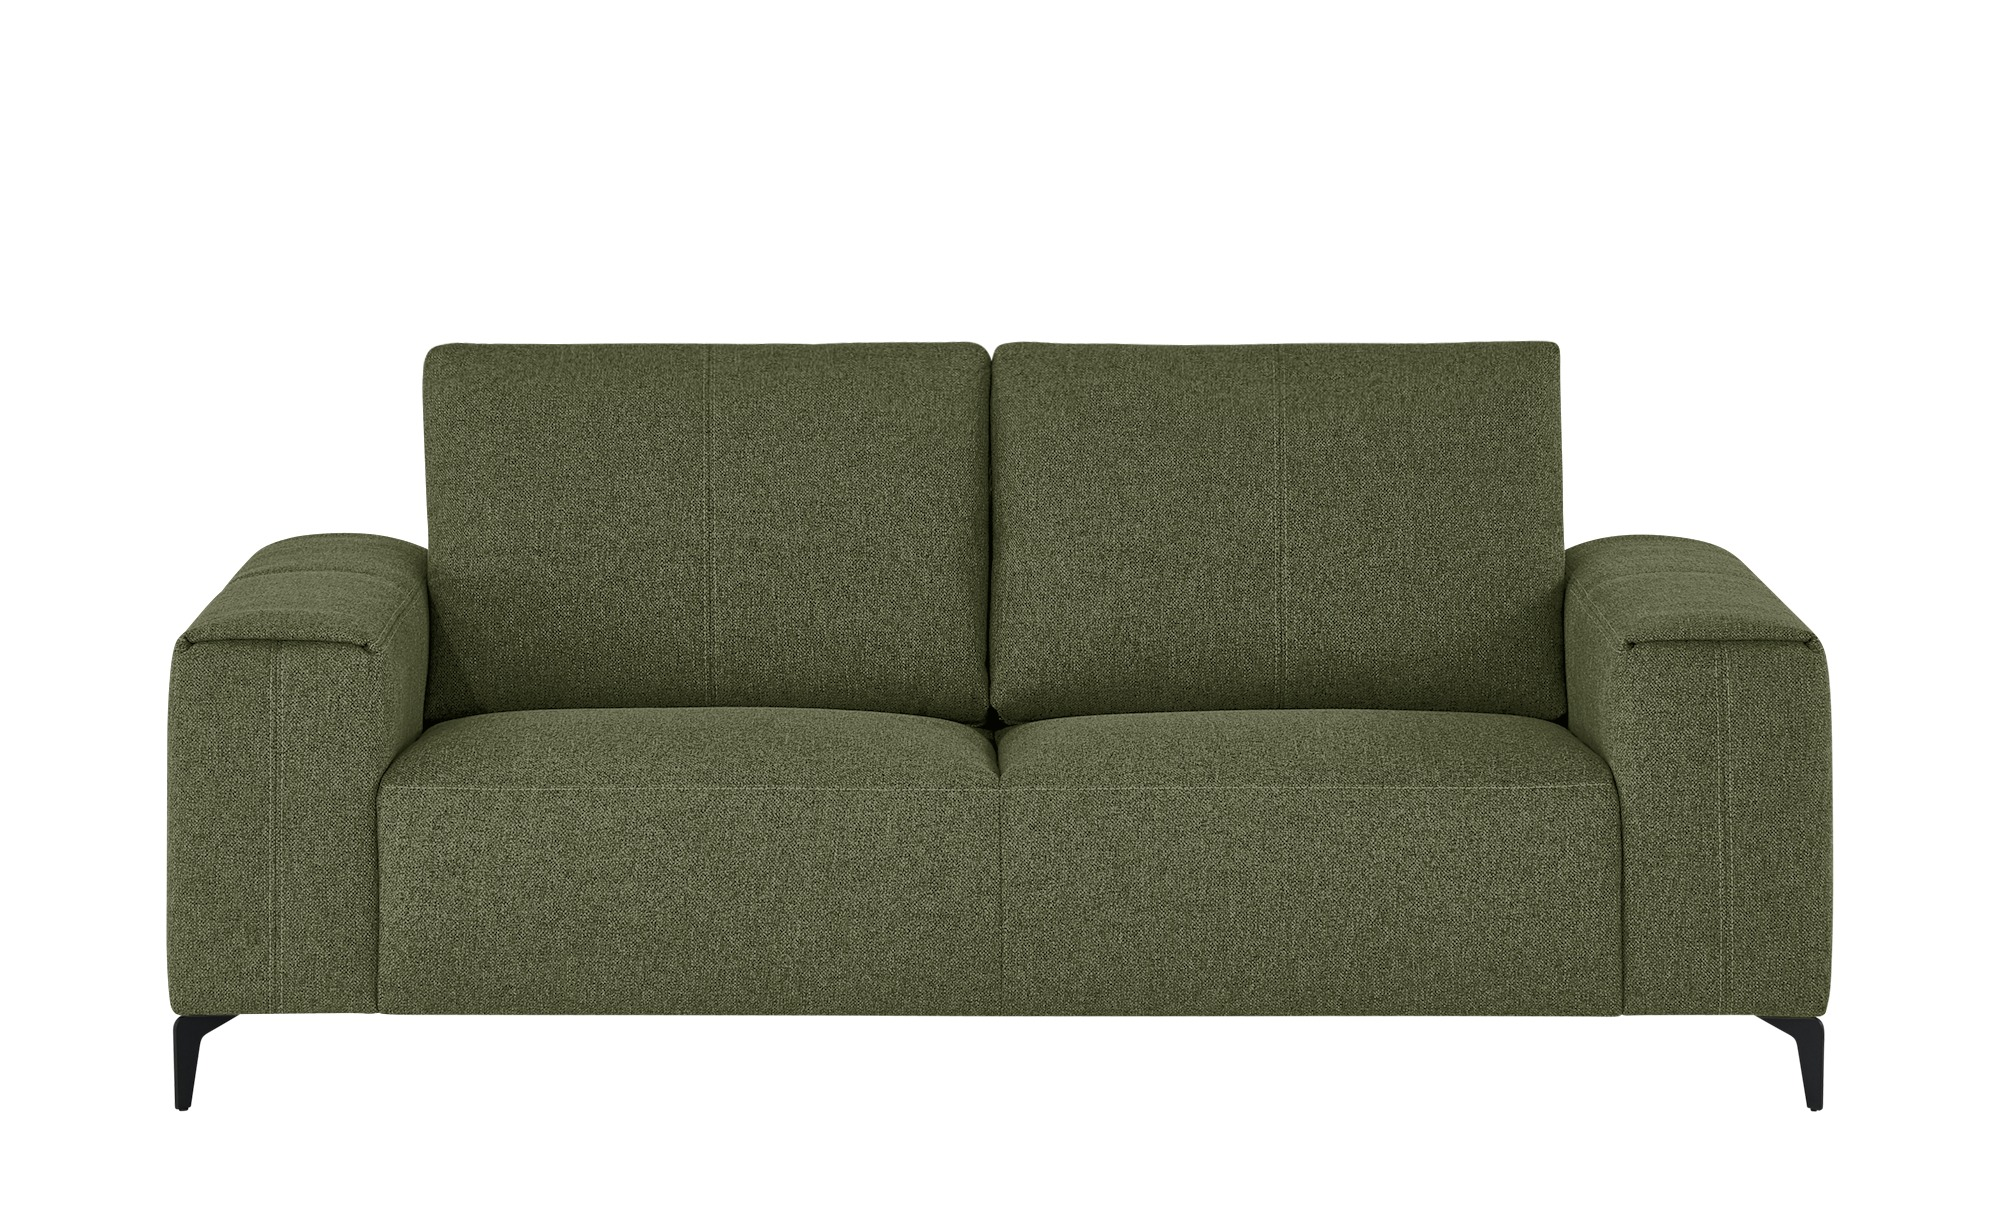 smart Sofa  Gabriela ¦ grün ¦ Maße (cm): B: 202 H: 90 T: 91 Polstermöbel > Sofas > 2-Sitzer - Höffner